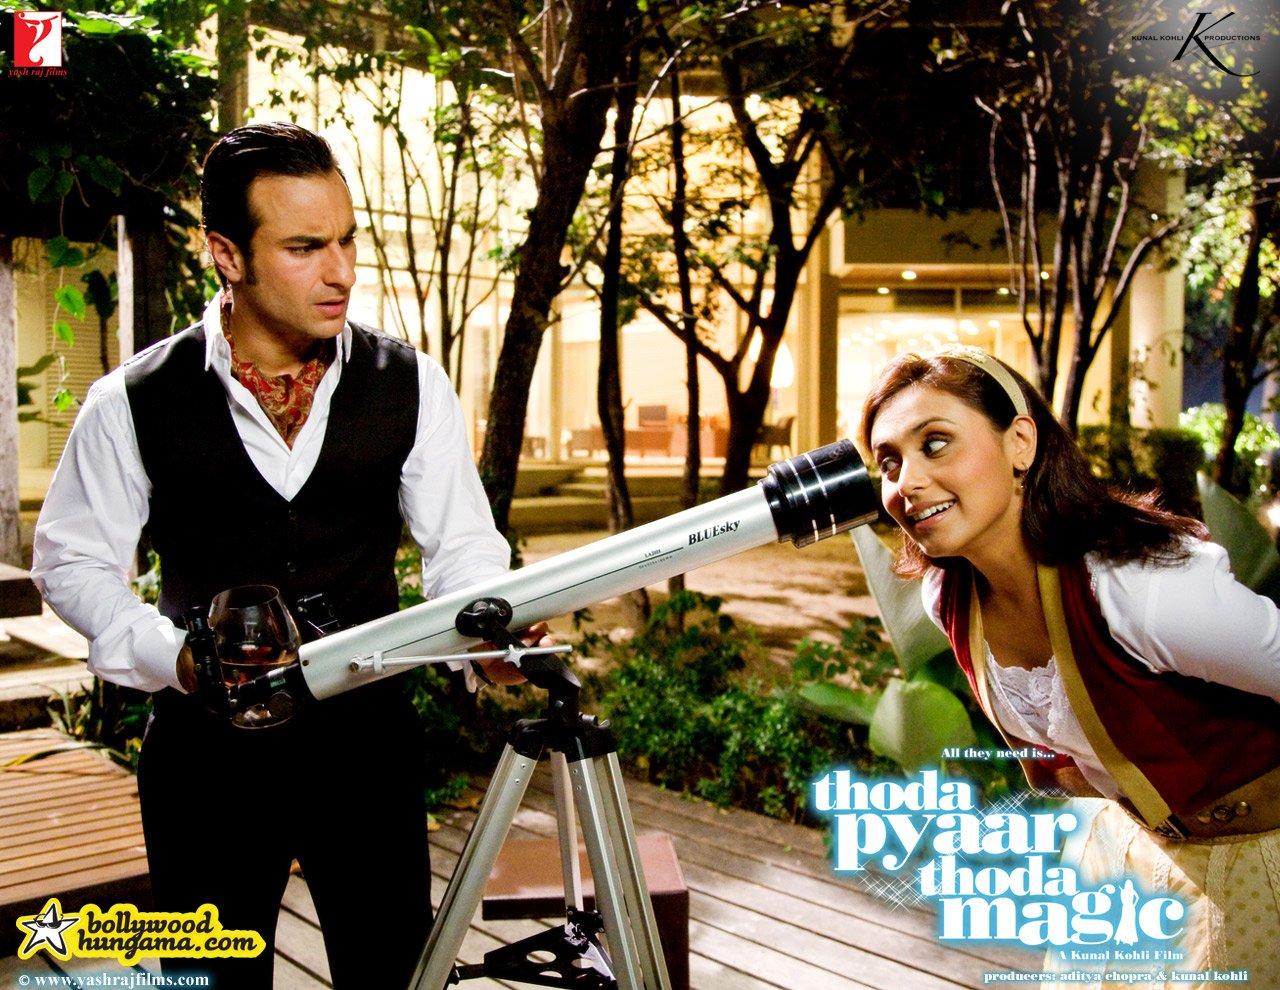 http://i.indiafm.com/posters/movies/08/thodapyaarthodamagic/still27.jpg